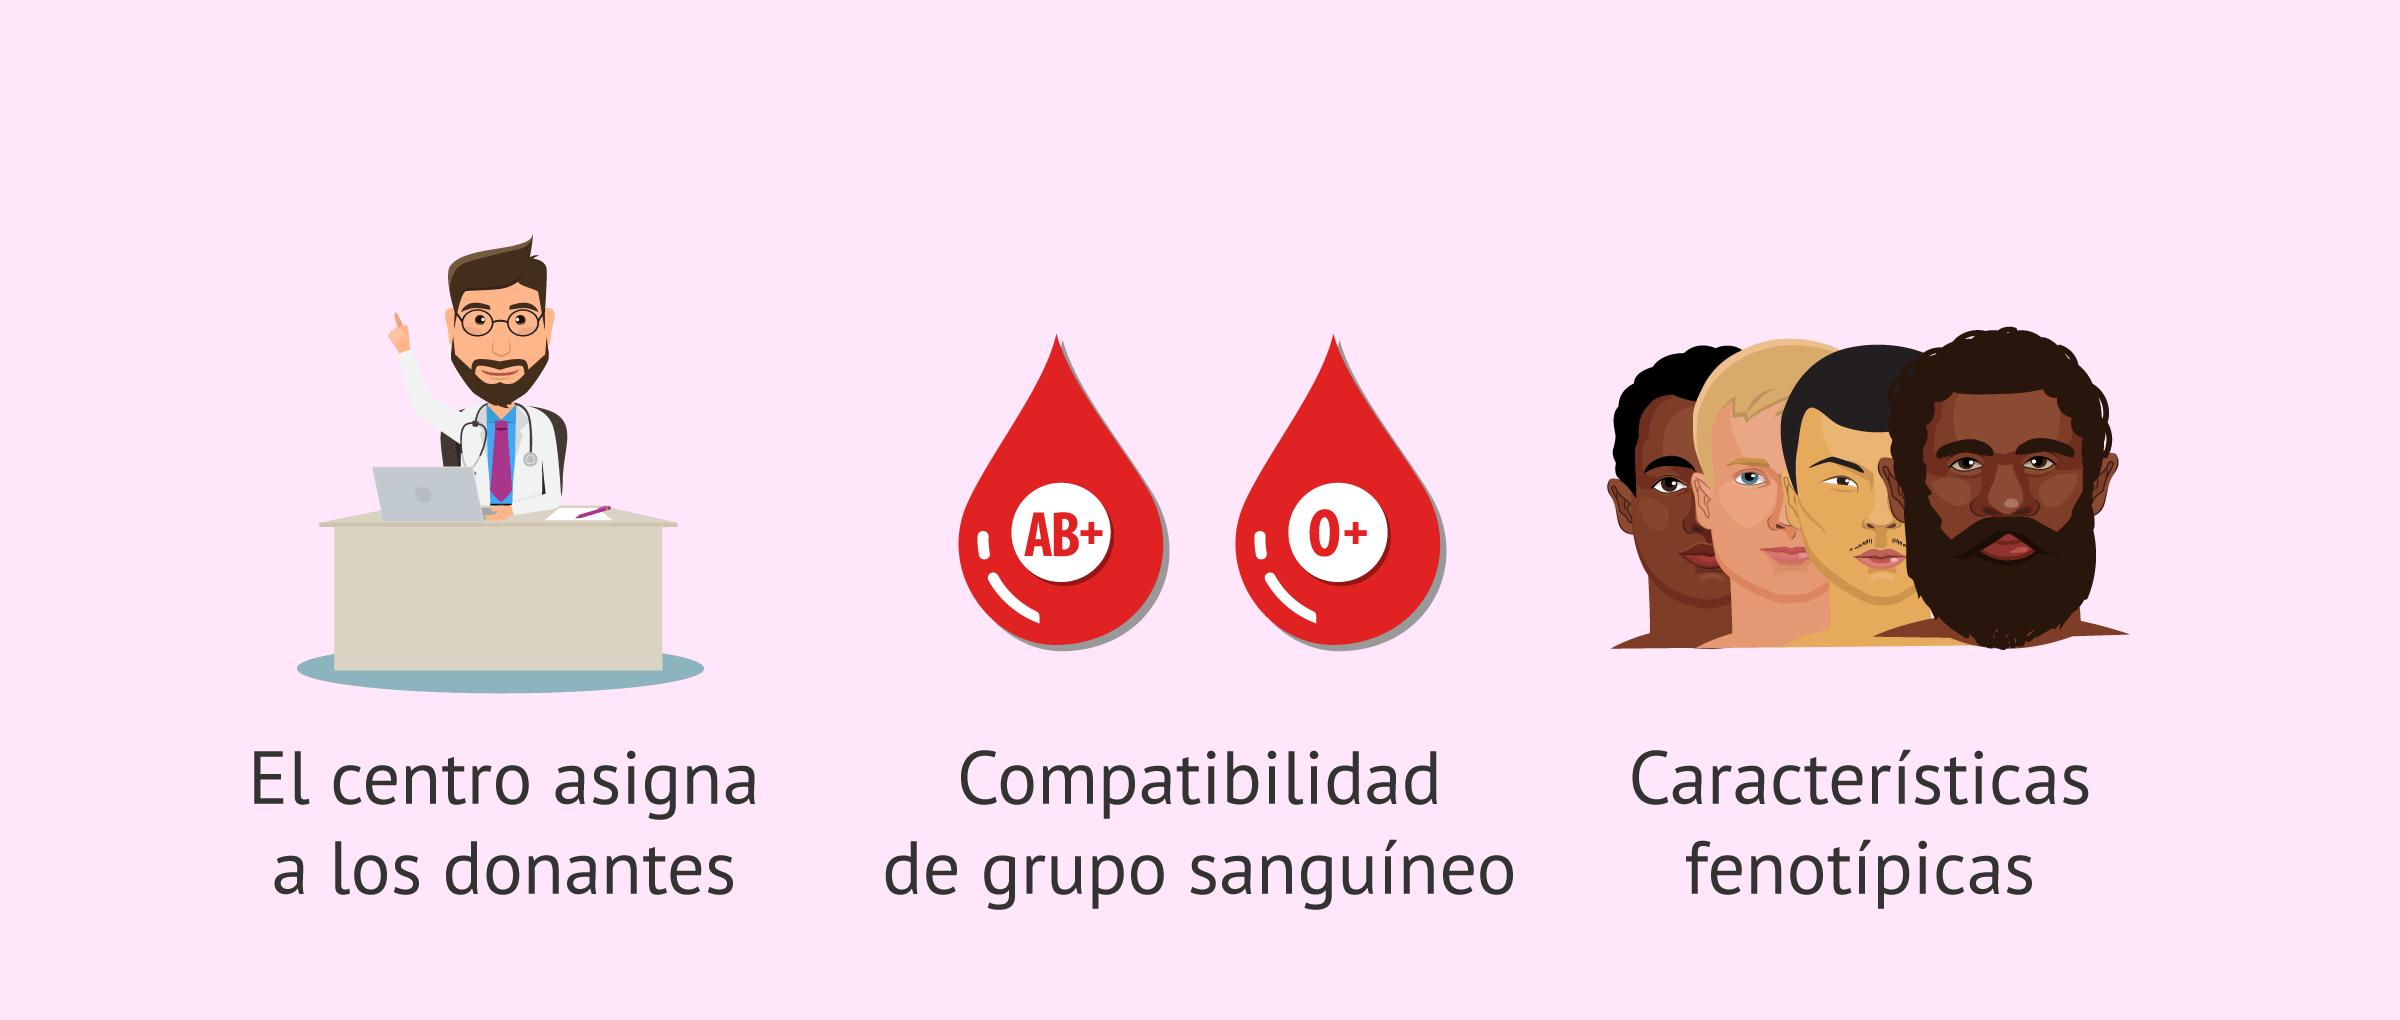 Criterios de asignación de donantes de esperma